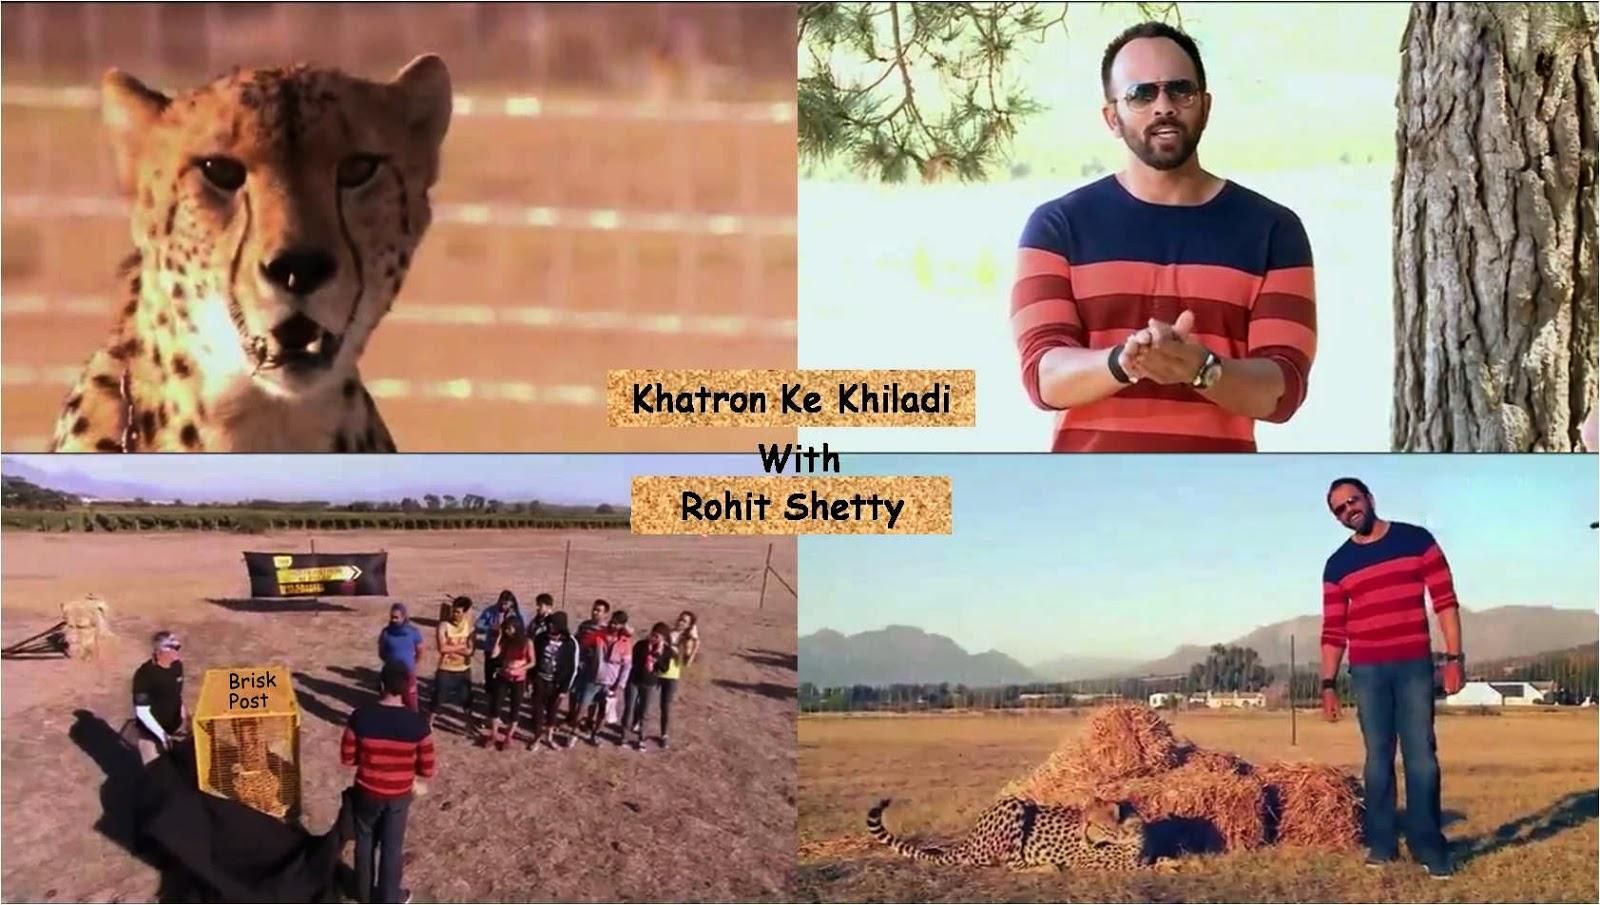 Rohit Shetty featured tiger for Fear Factor Khatron Ke Khiladi contestants